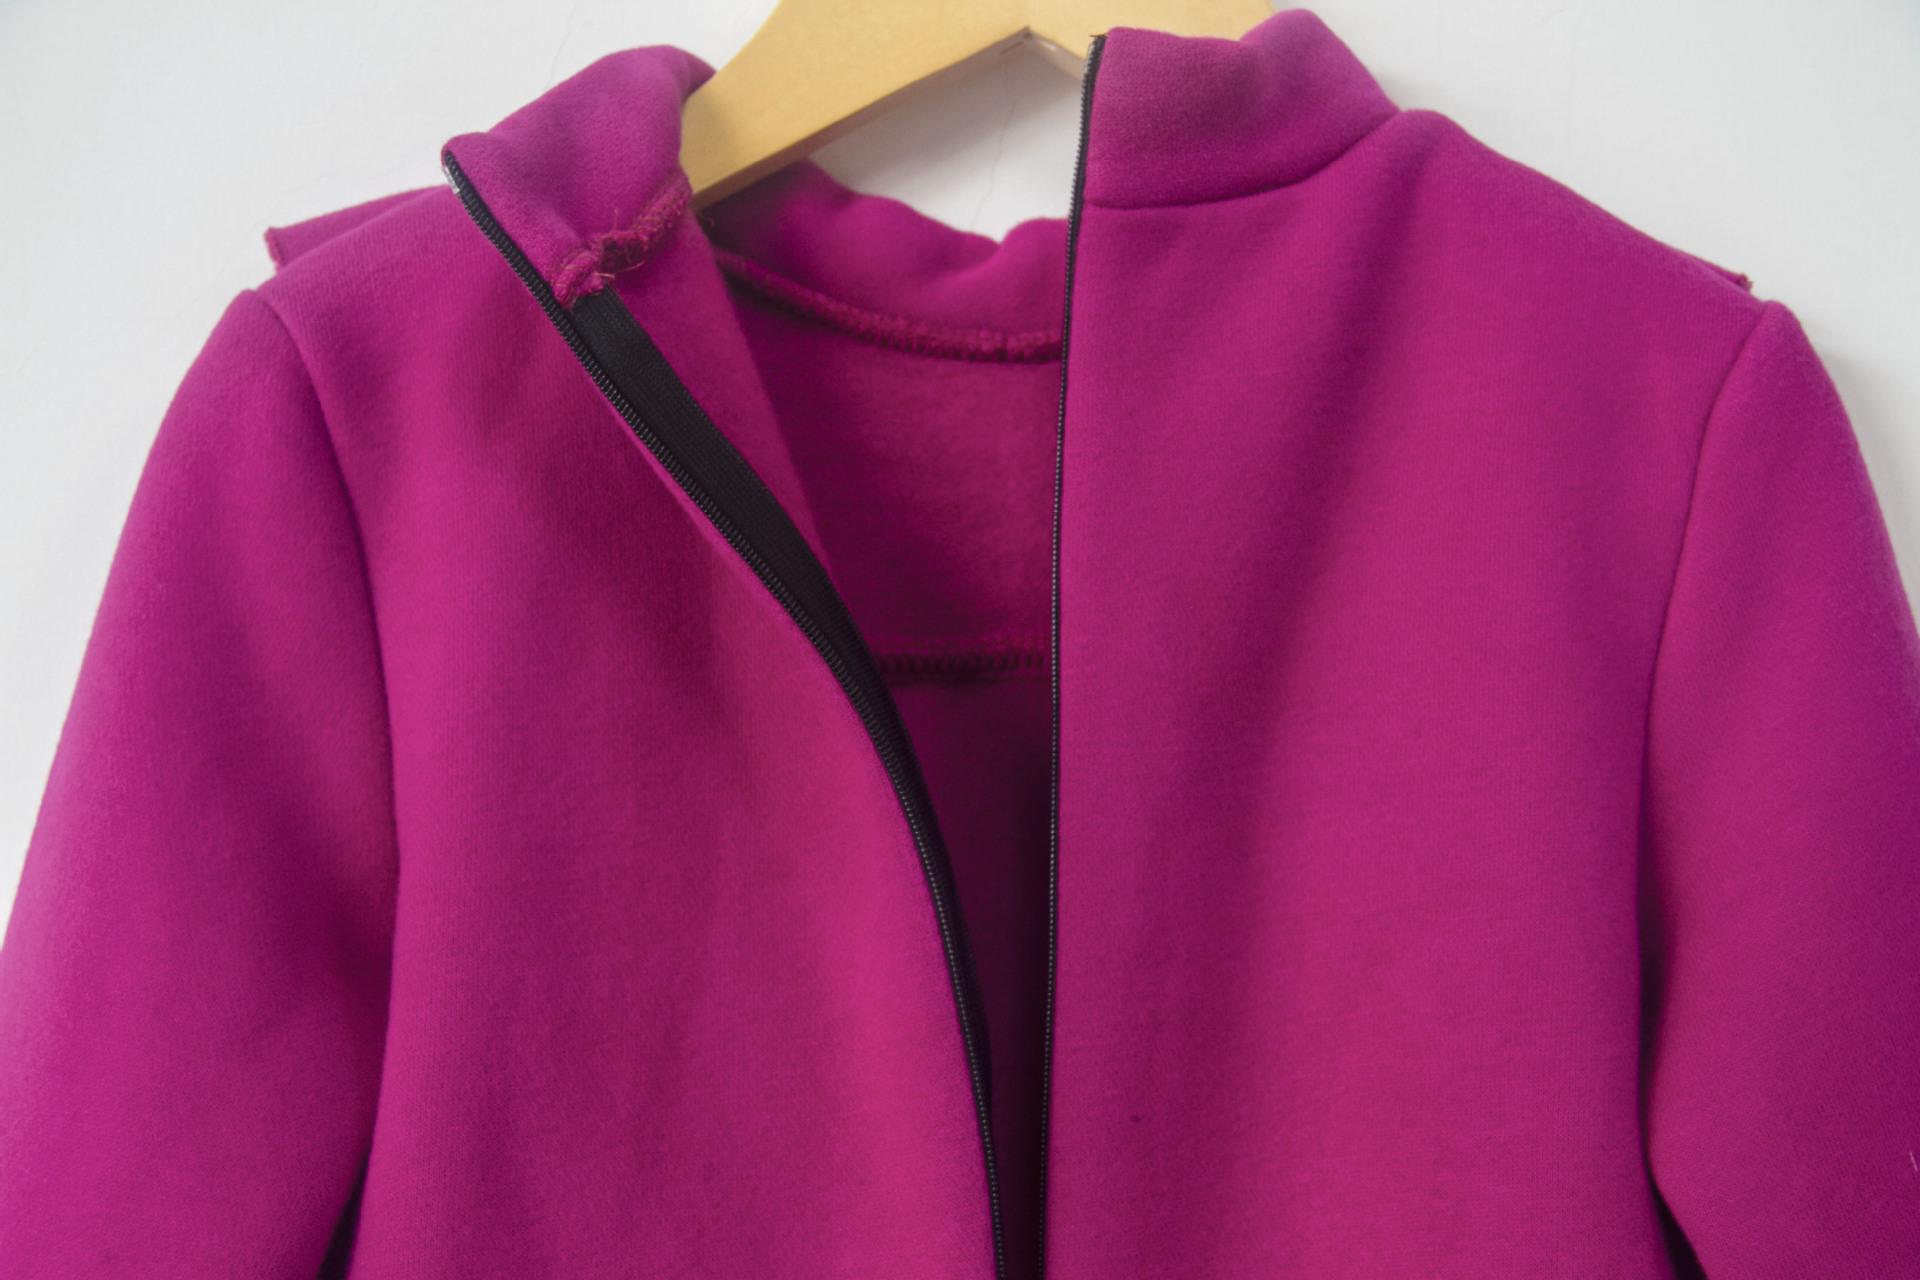 Thick Velvet Girls Dress 2018 Autumn Winter Teenager Girl Warm Fleece Purple Sweatshirt Dress Kids Ruffle Princess Party Frocks Y190516